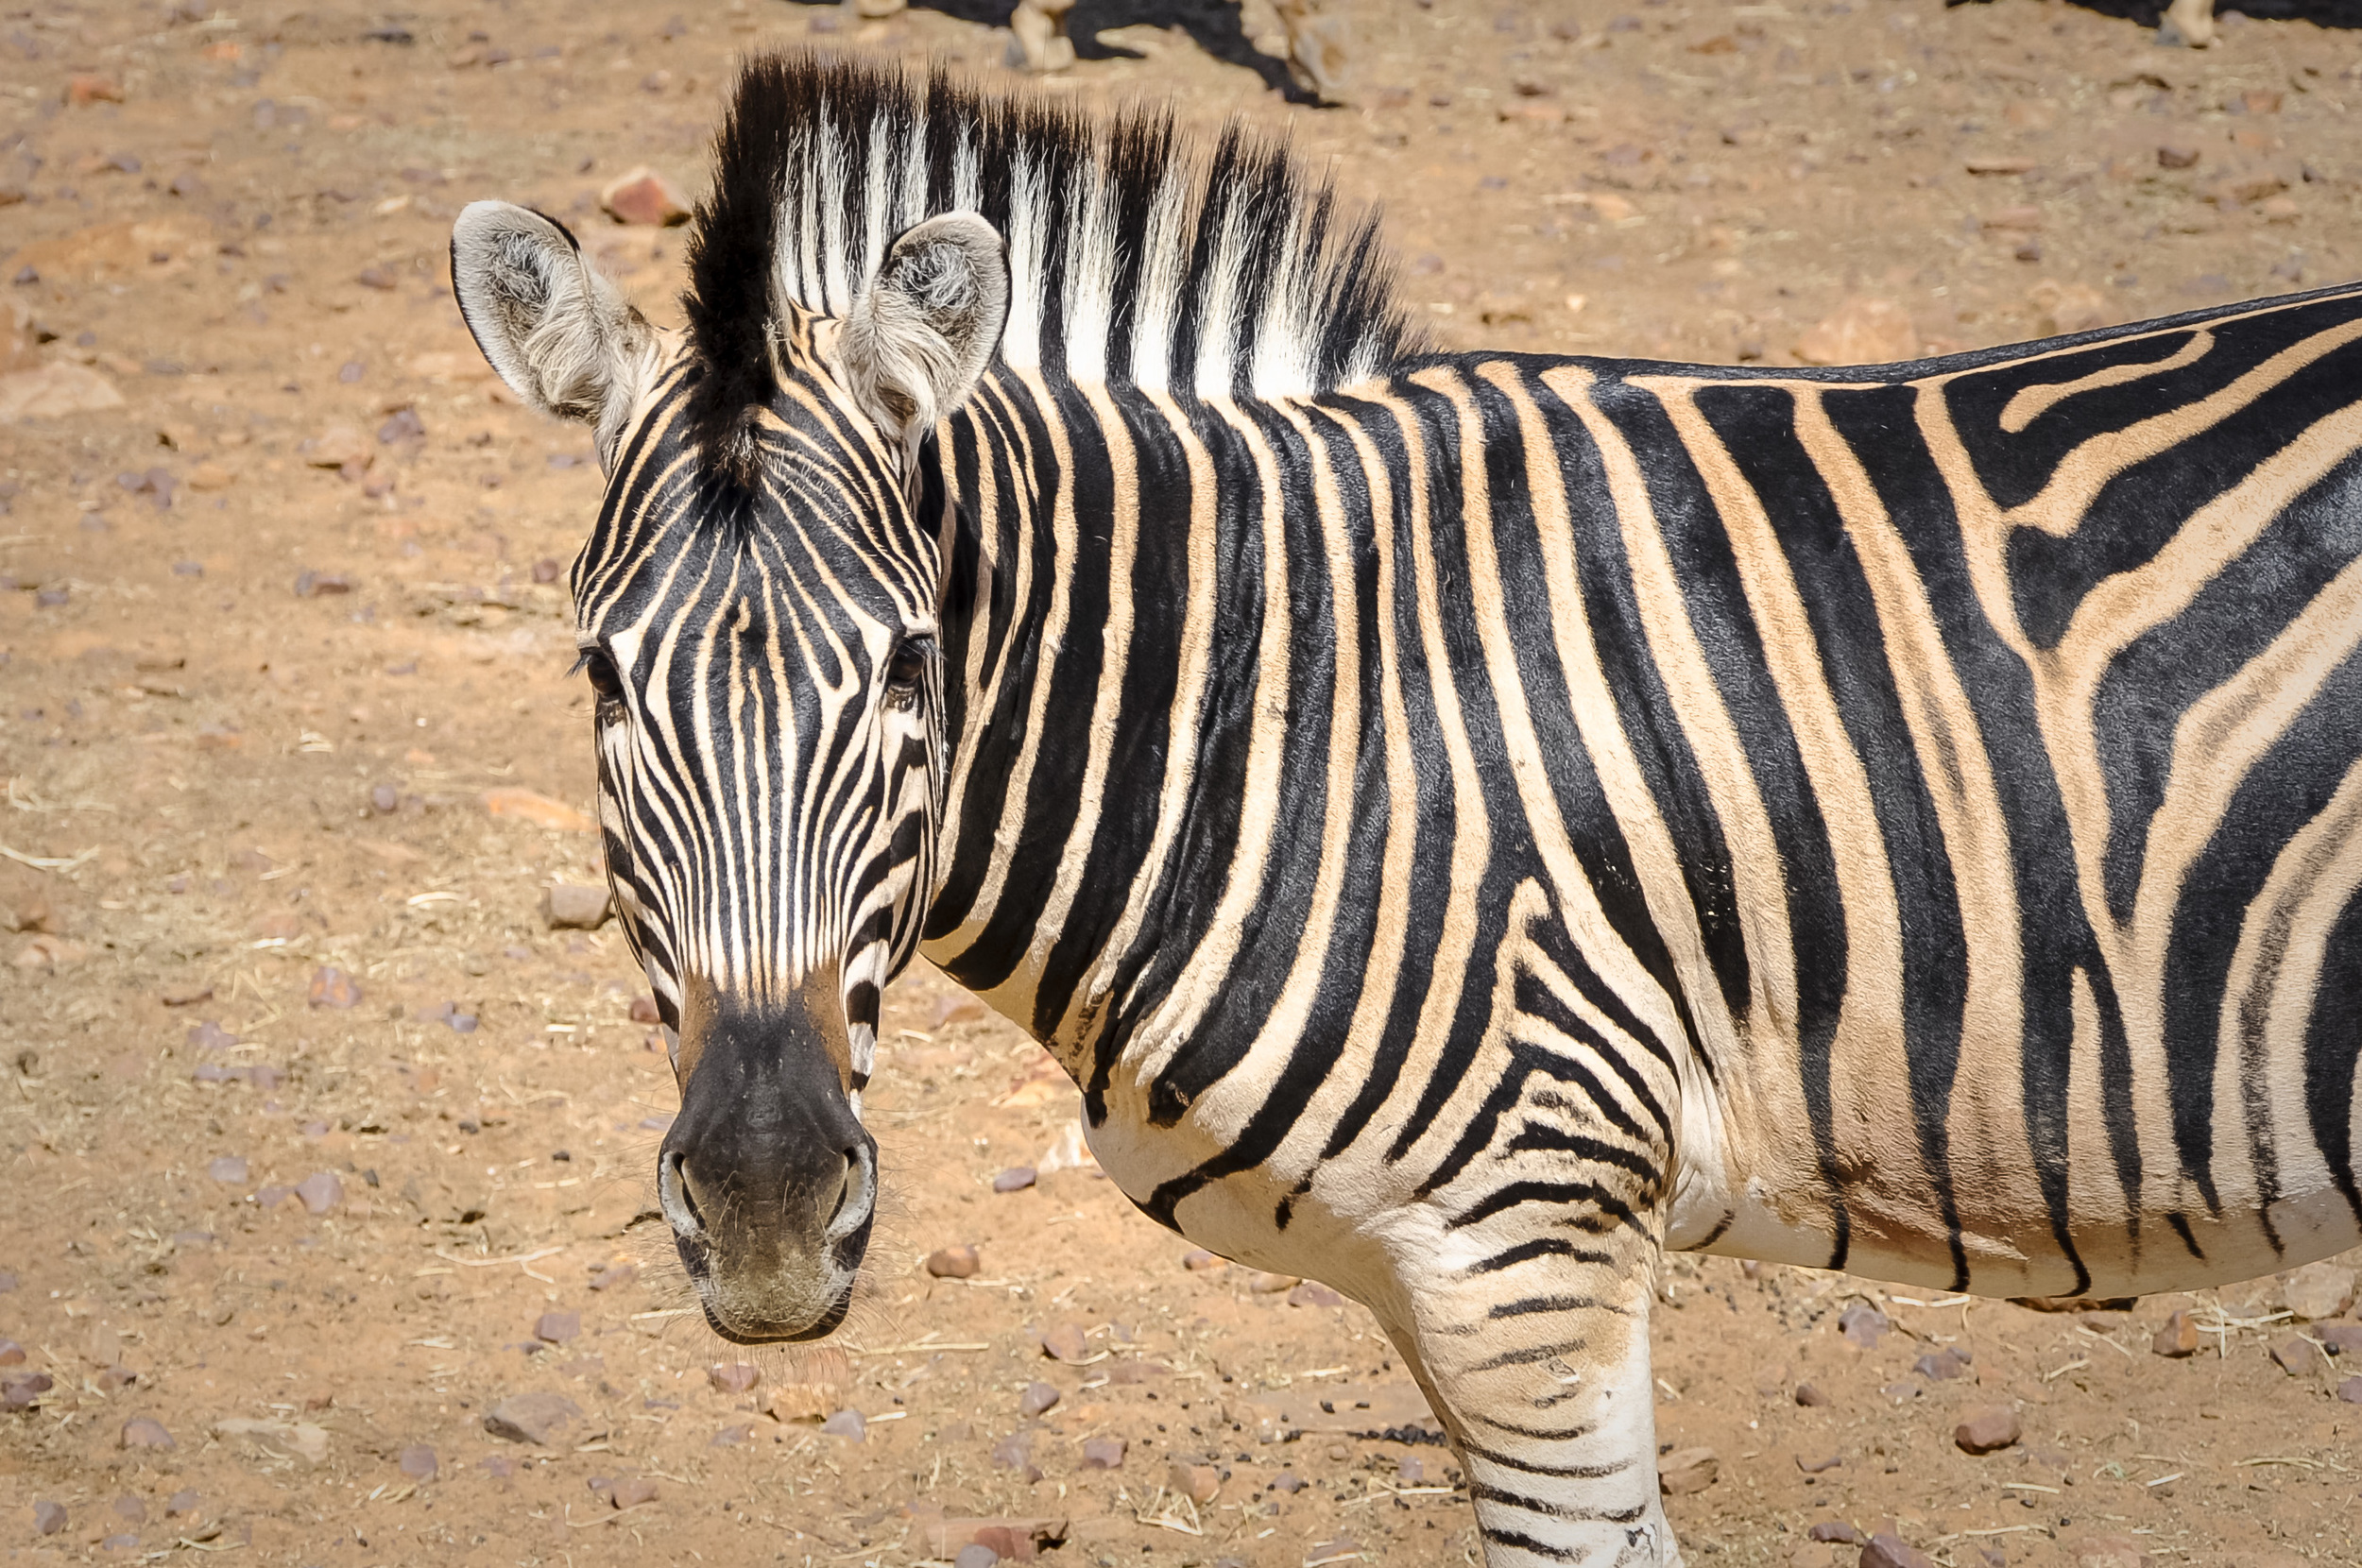 Zebra - Aquila Game Reserve